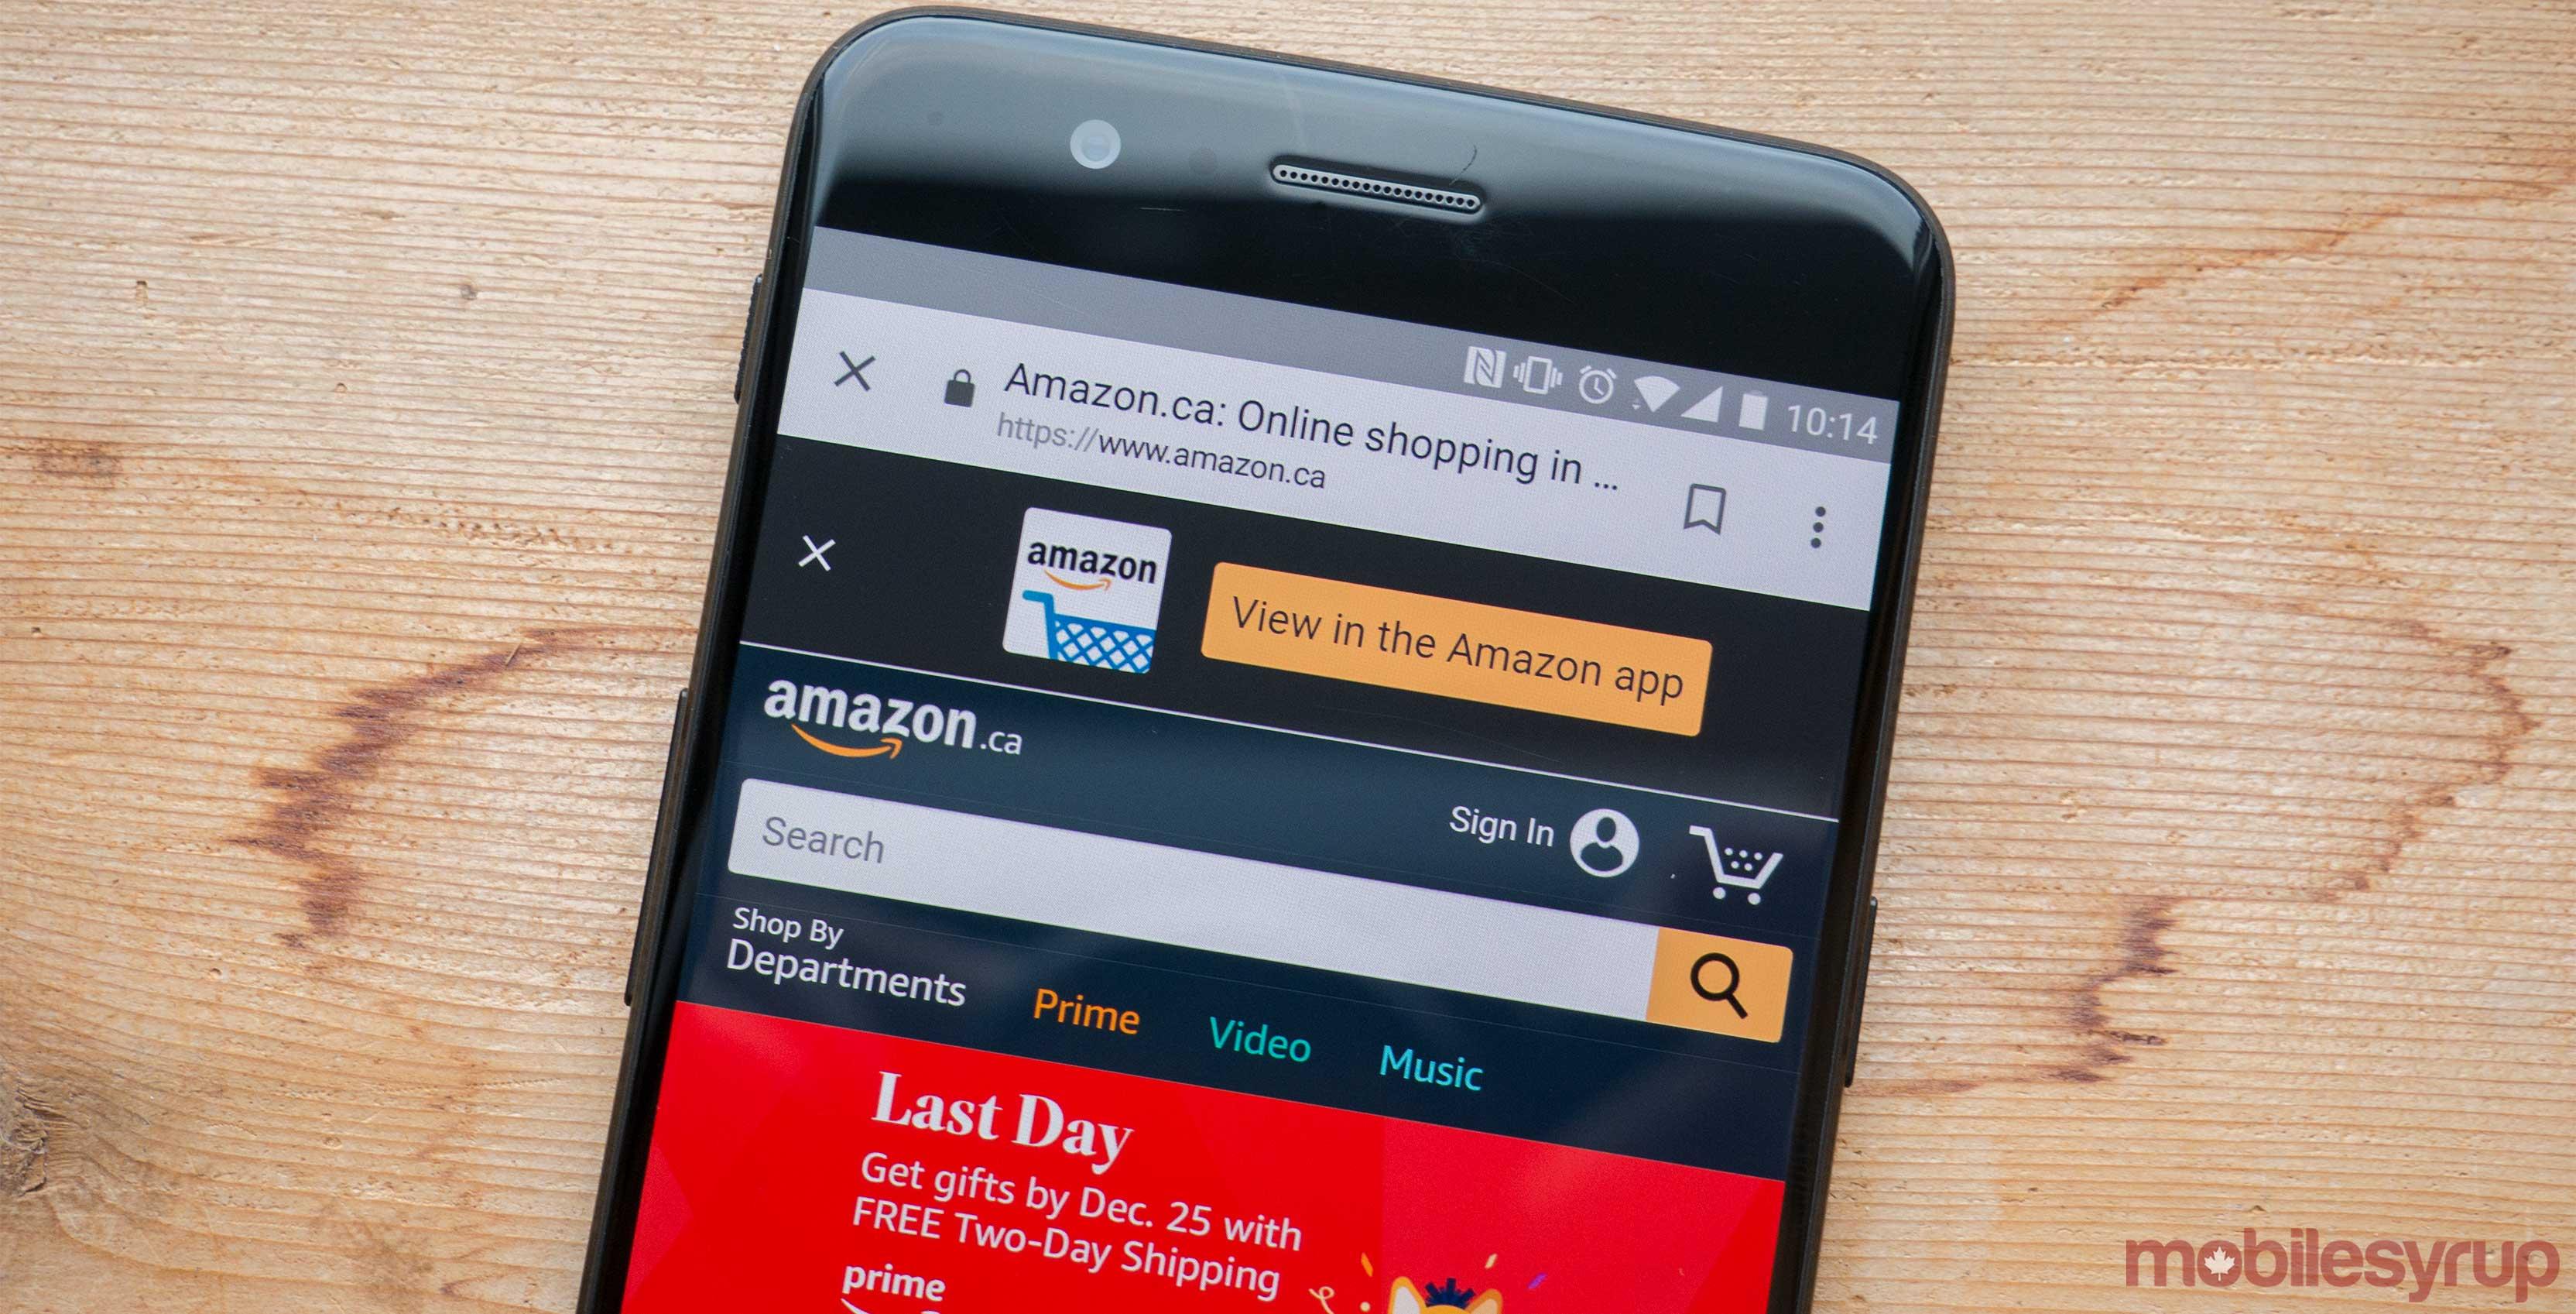 Amazon website on phone